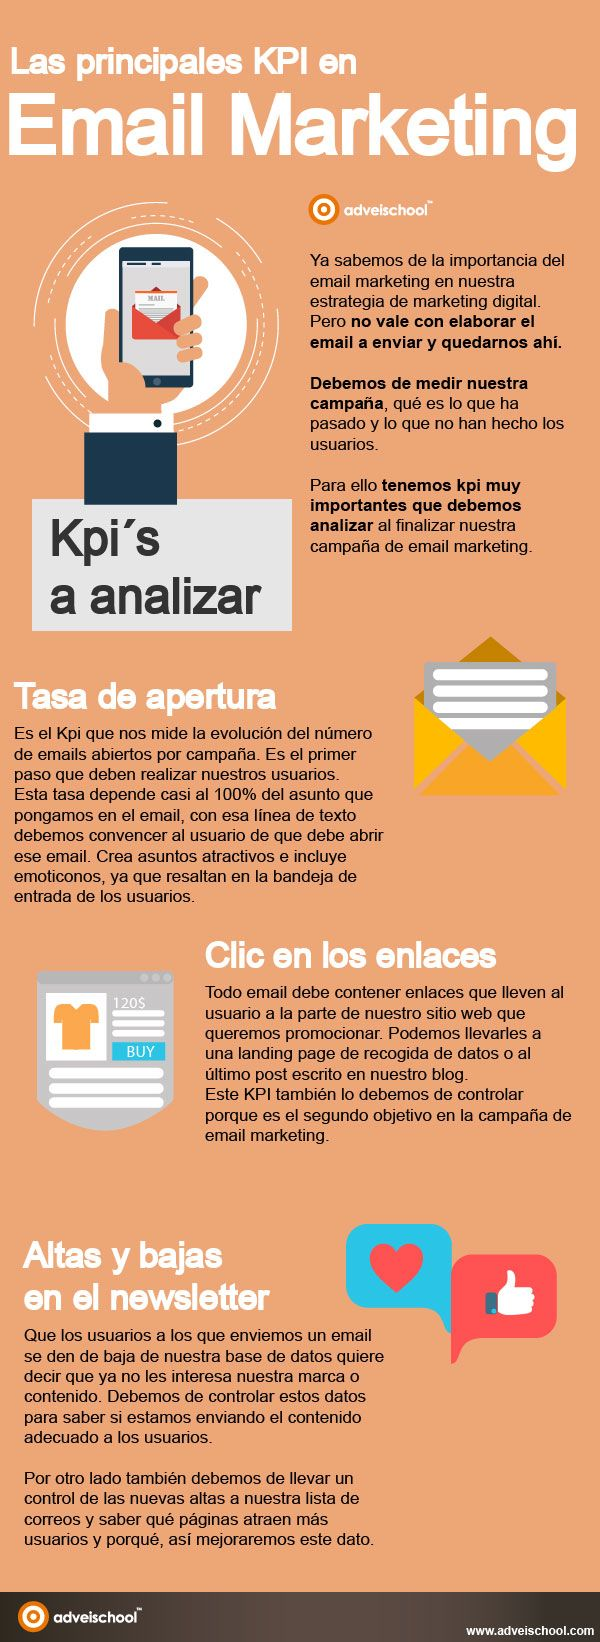 Las principales KPI en Email Marketing #infografia